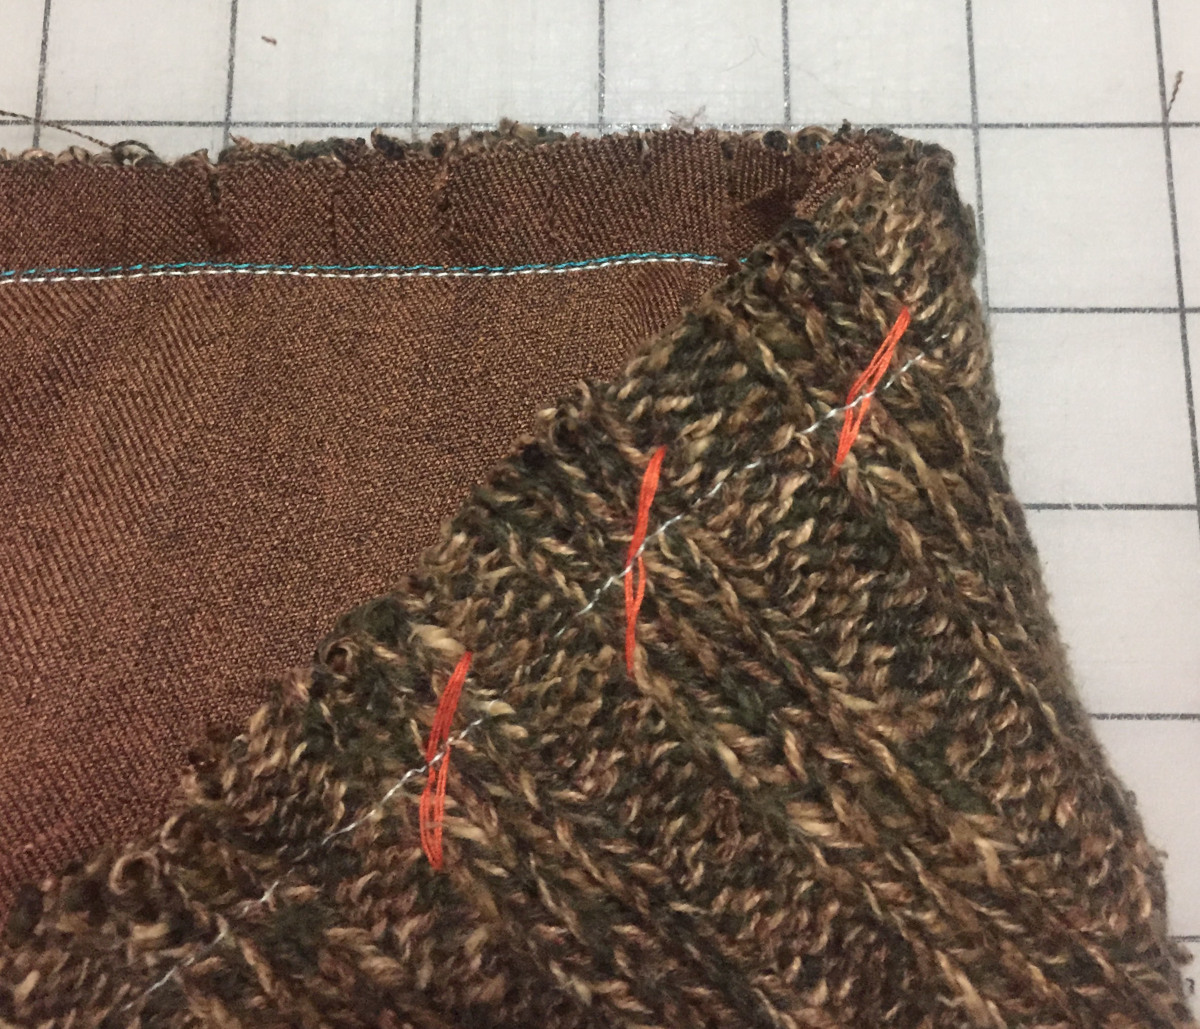 Stitch the basted collar